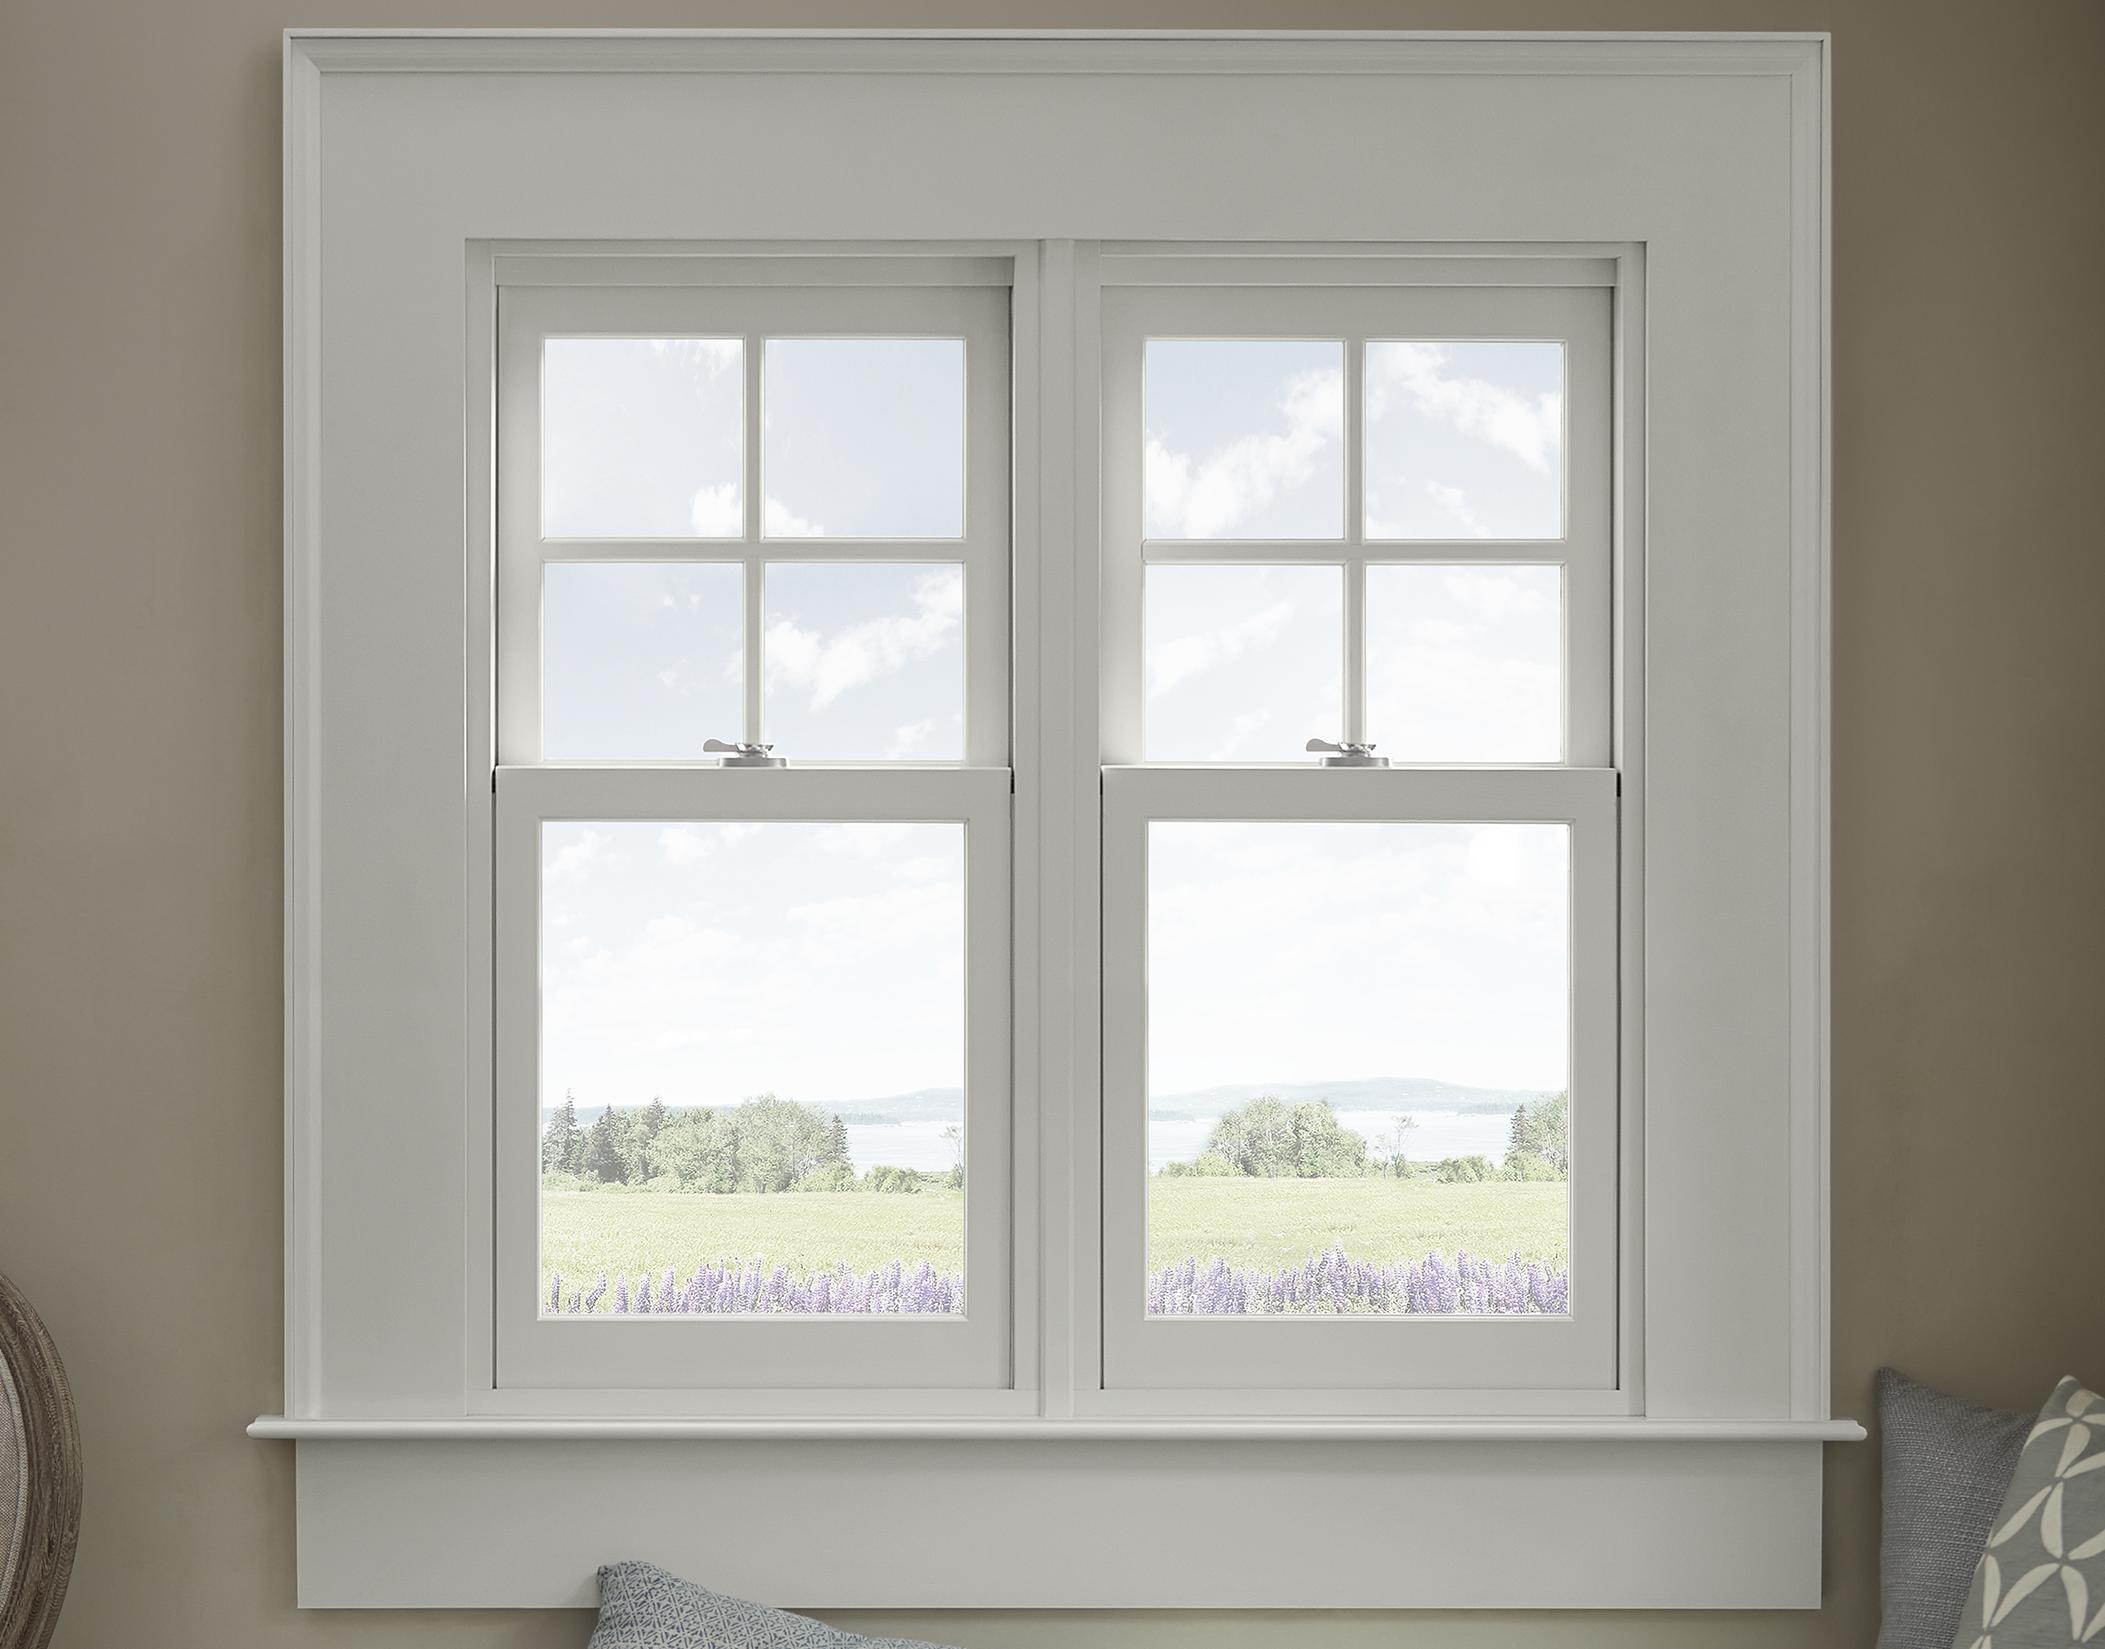 Window Installation By Evergreen Windows U0026 Doors In Portland U0026 Rockland, ...